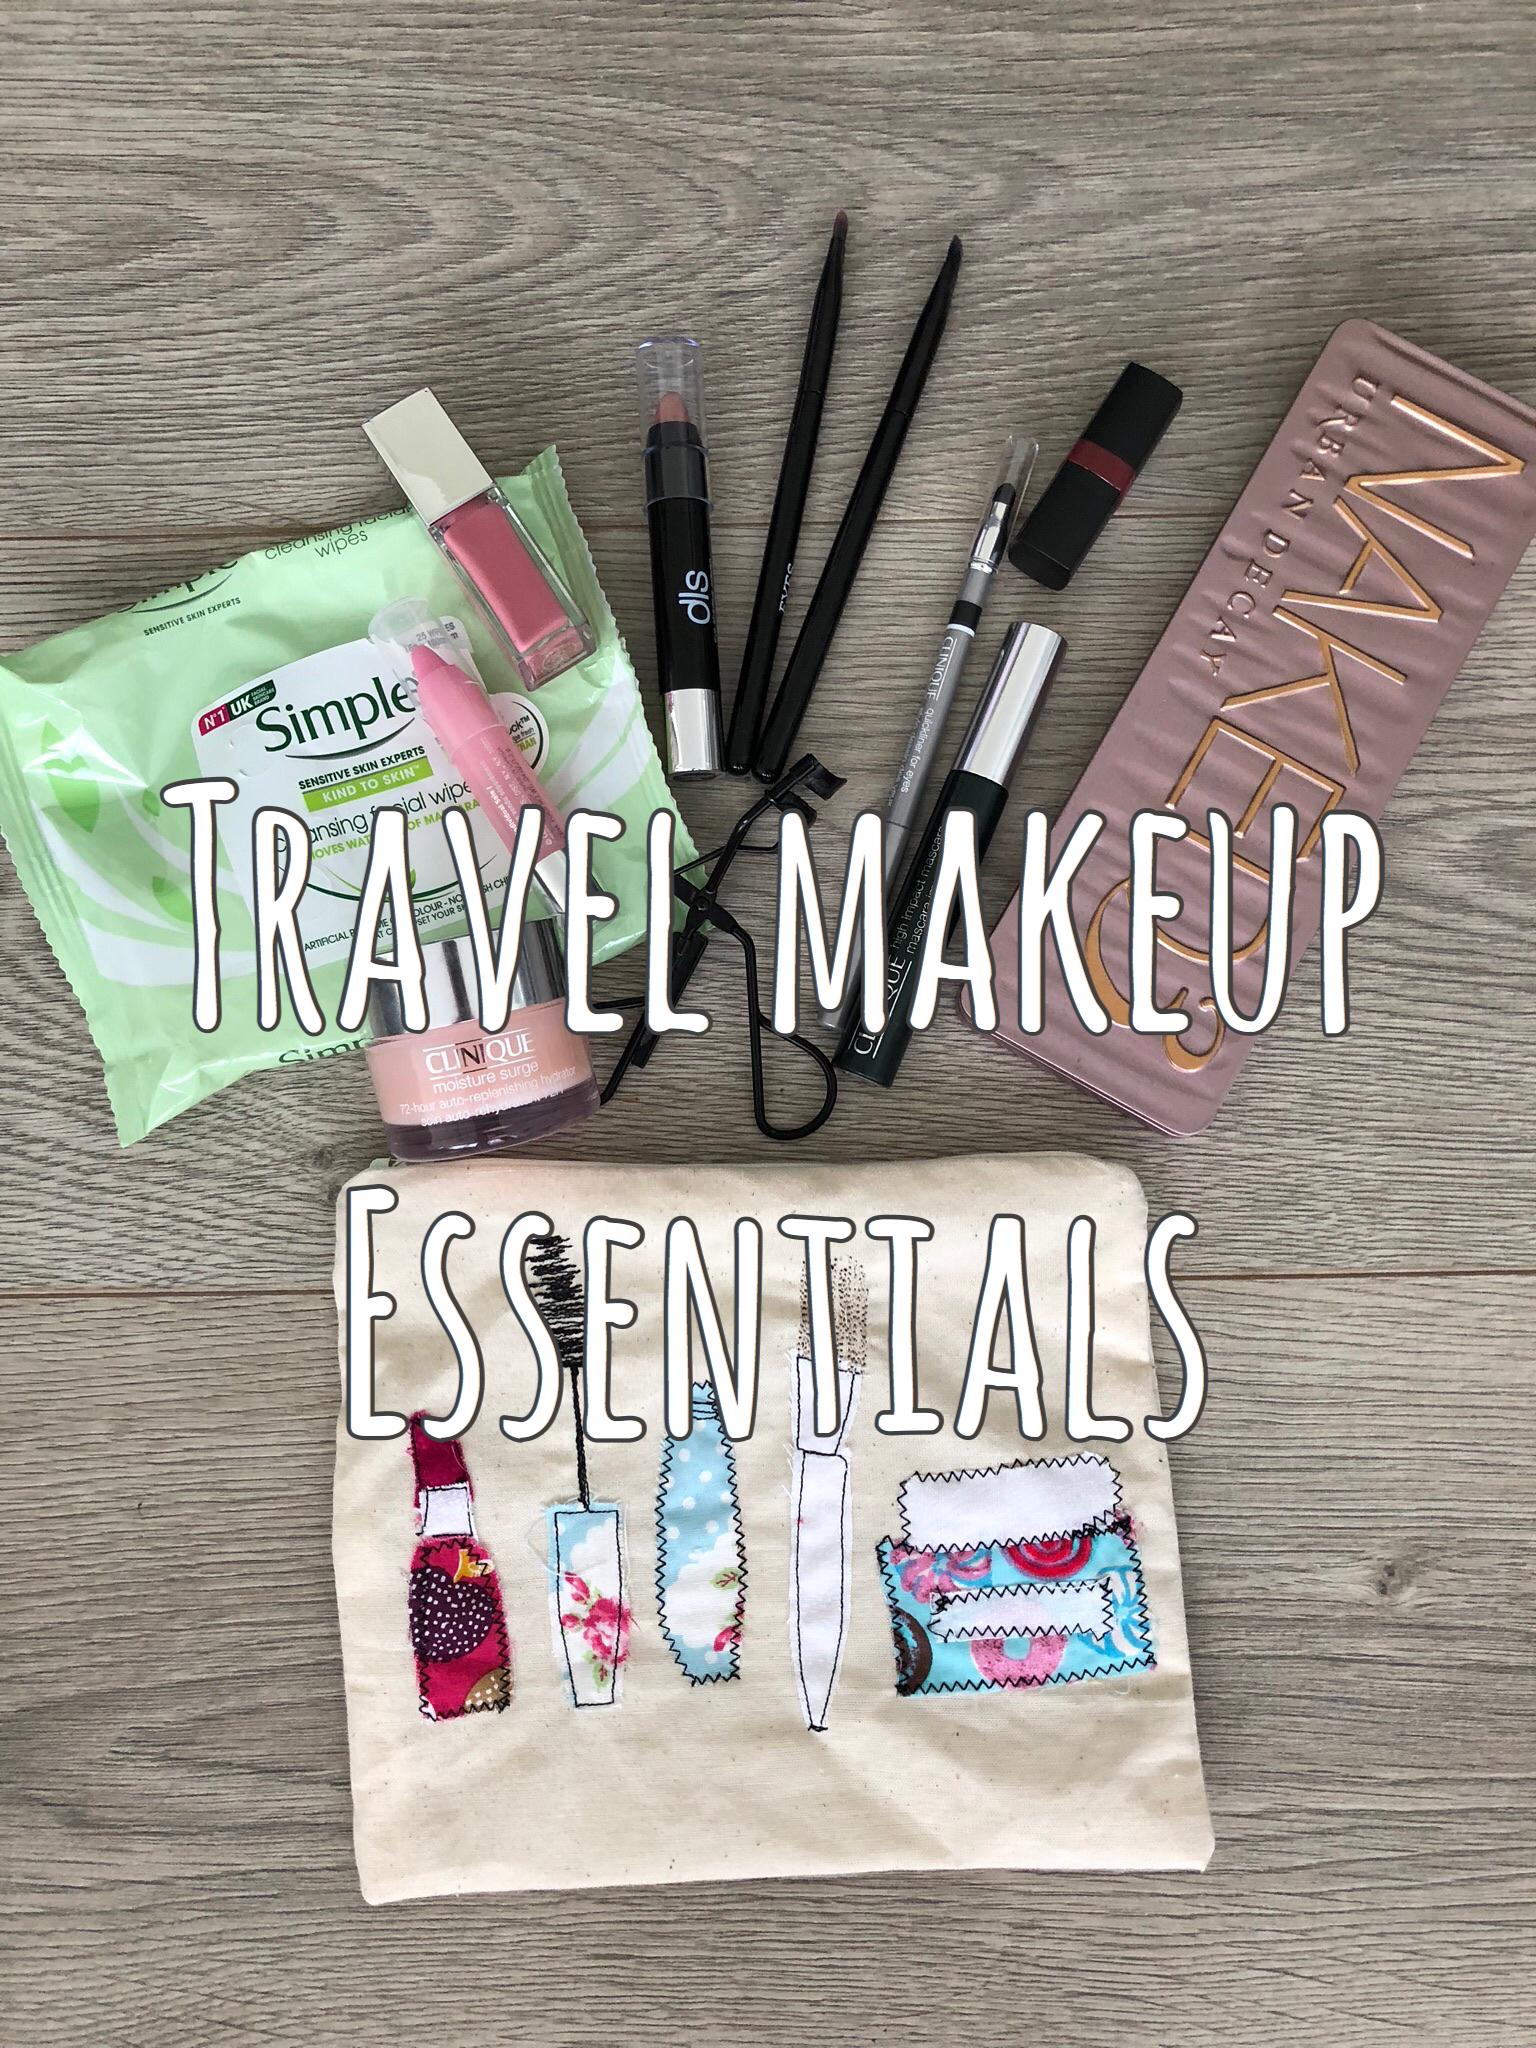 My Travel Makeup Essentials graphic